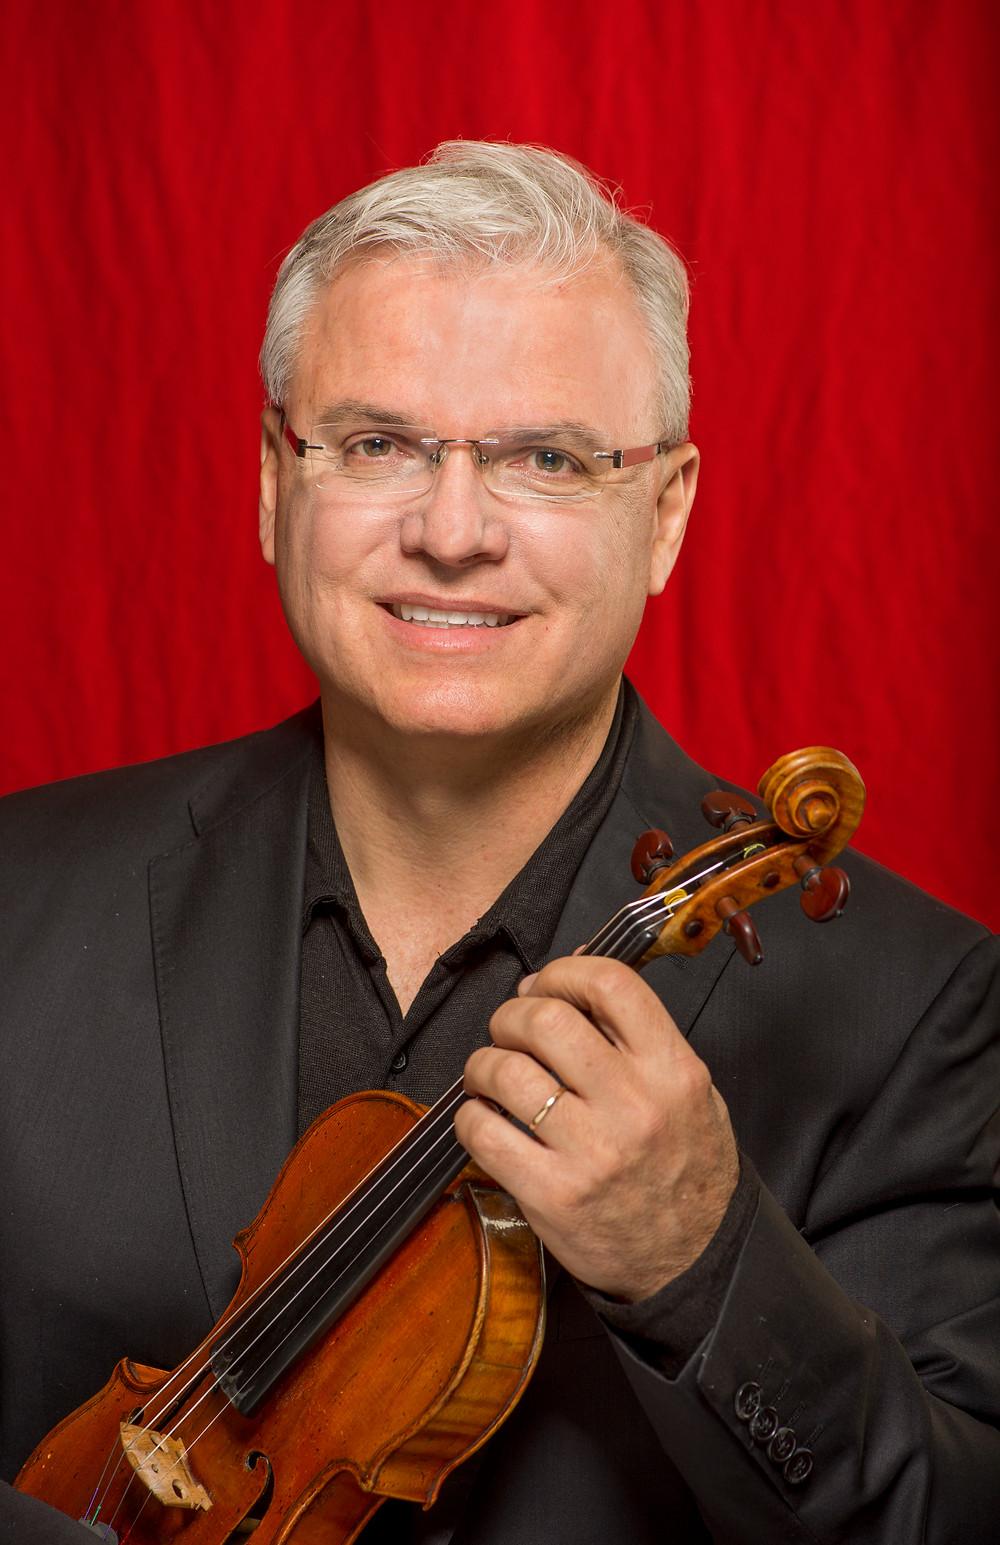 SLSO Concertmaster David Halen